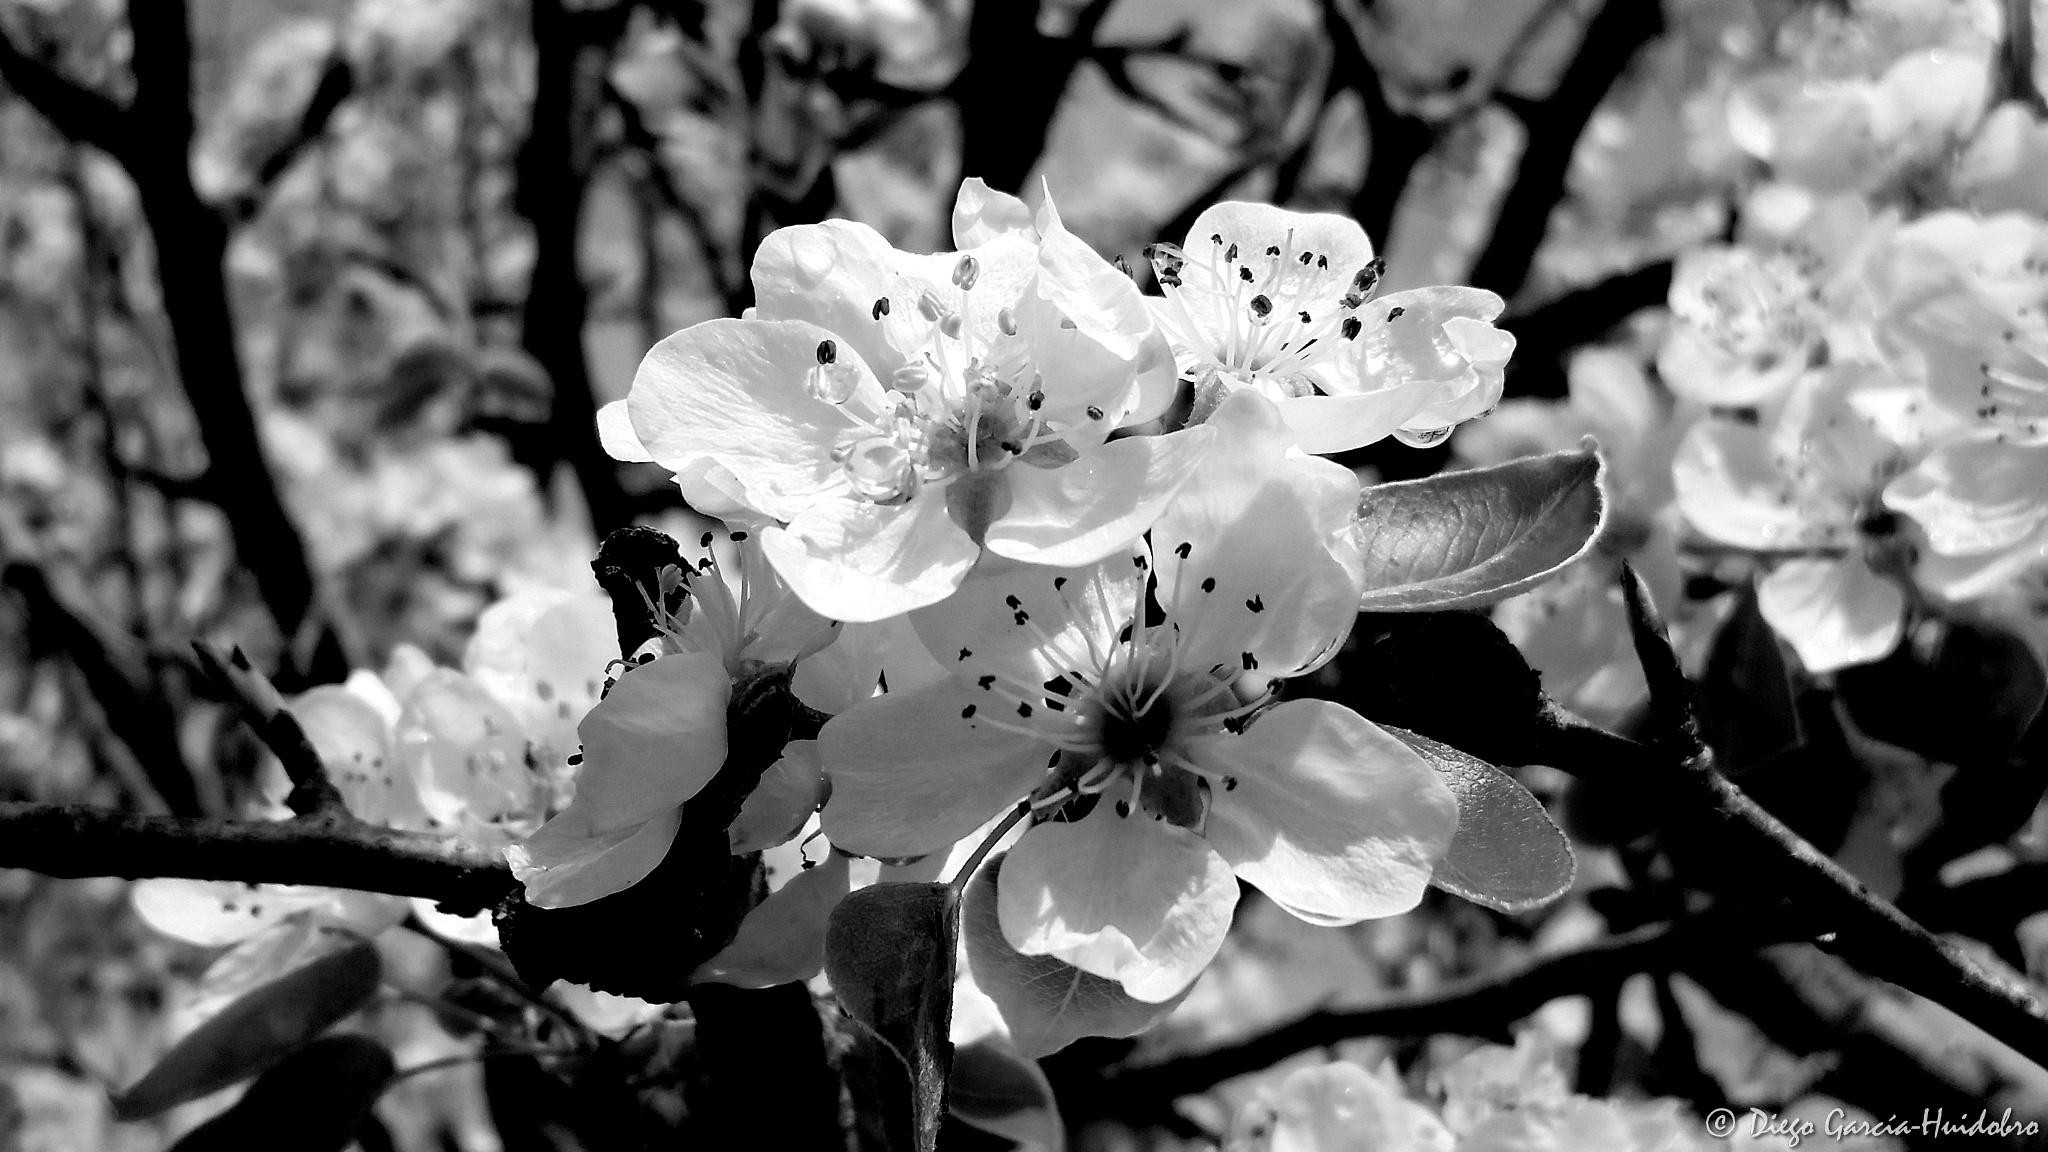 Flower inWhite by Diego García-Huidobro